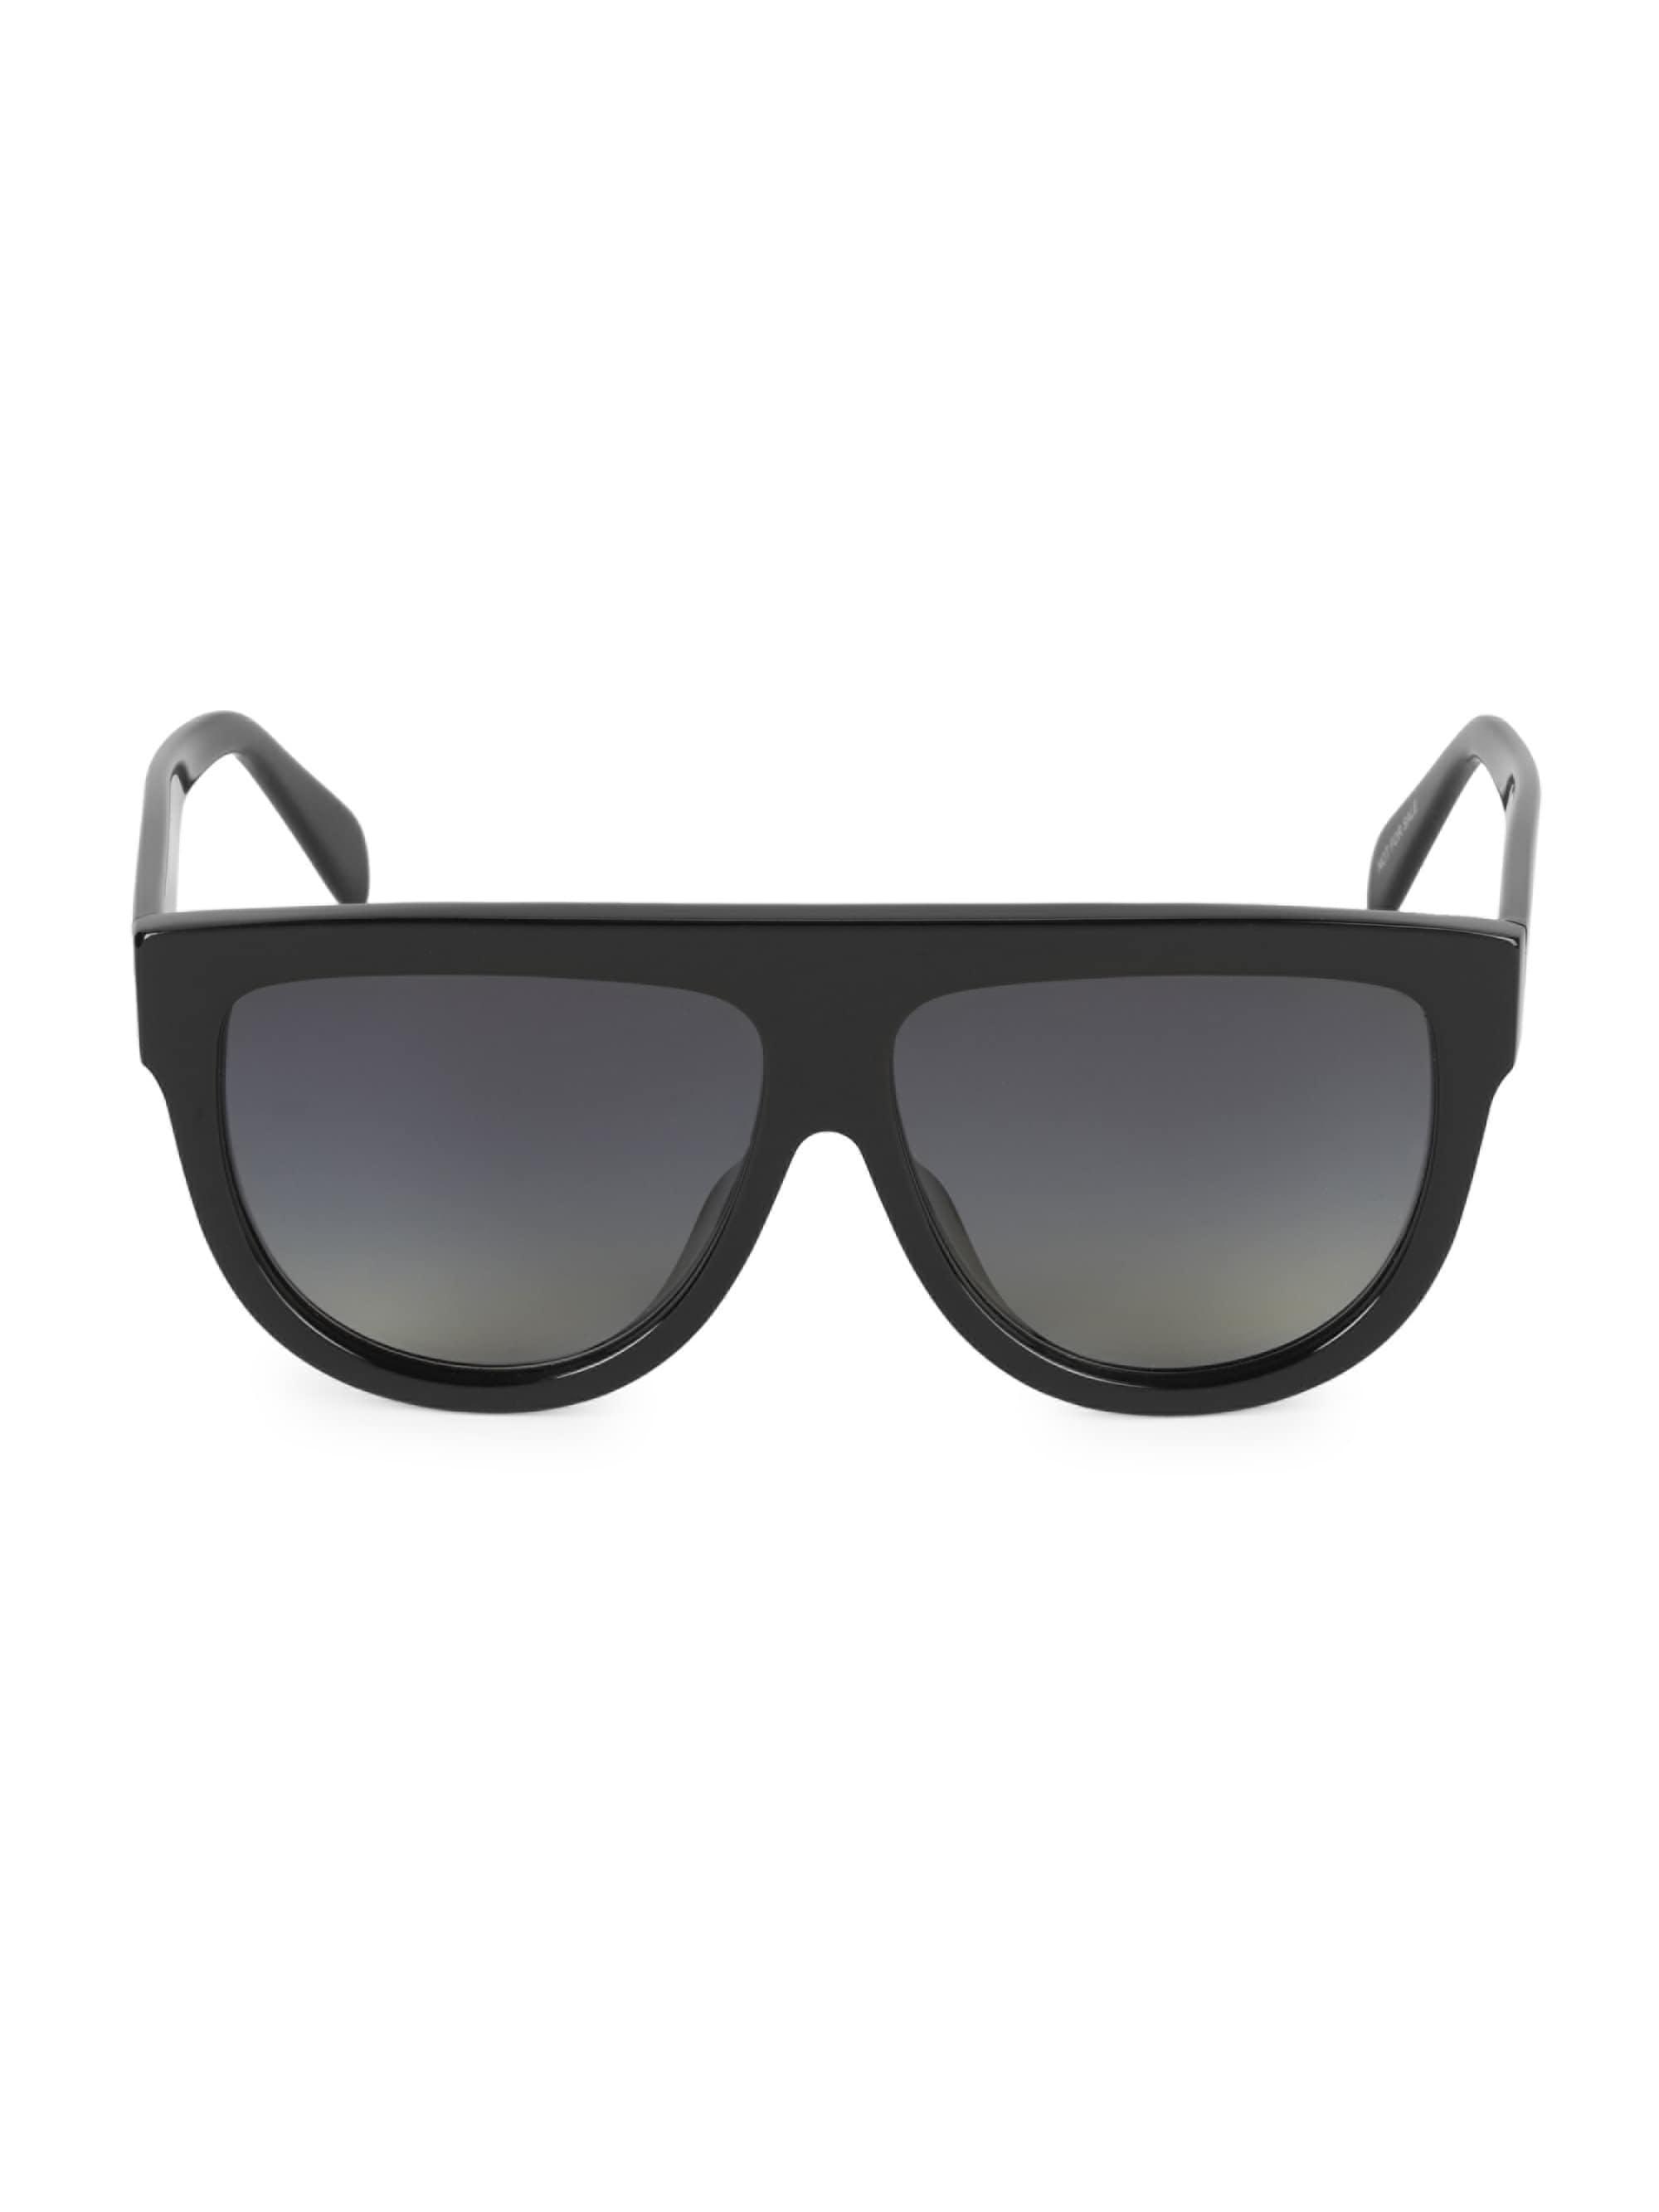 f2056c20346 Lyst - Céline Men s 58mm Flat Top Pilot Sunglasses - Black in Black ...